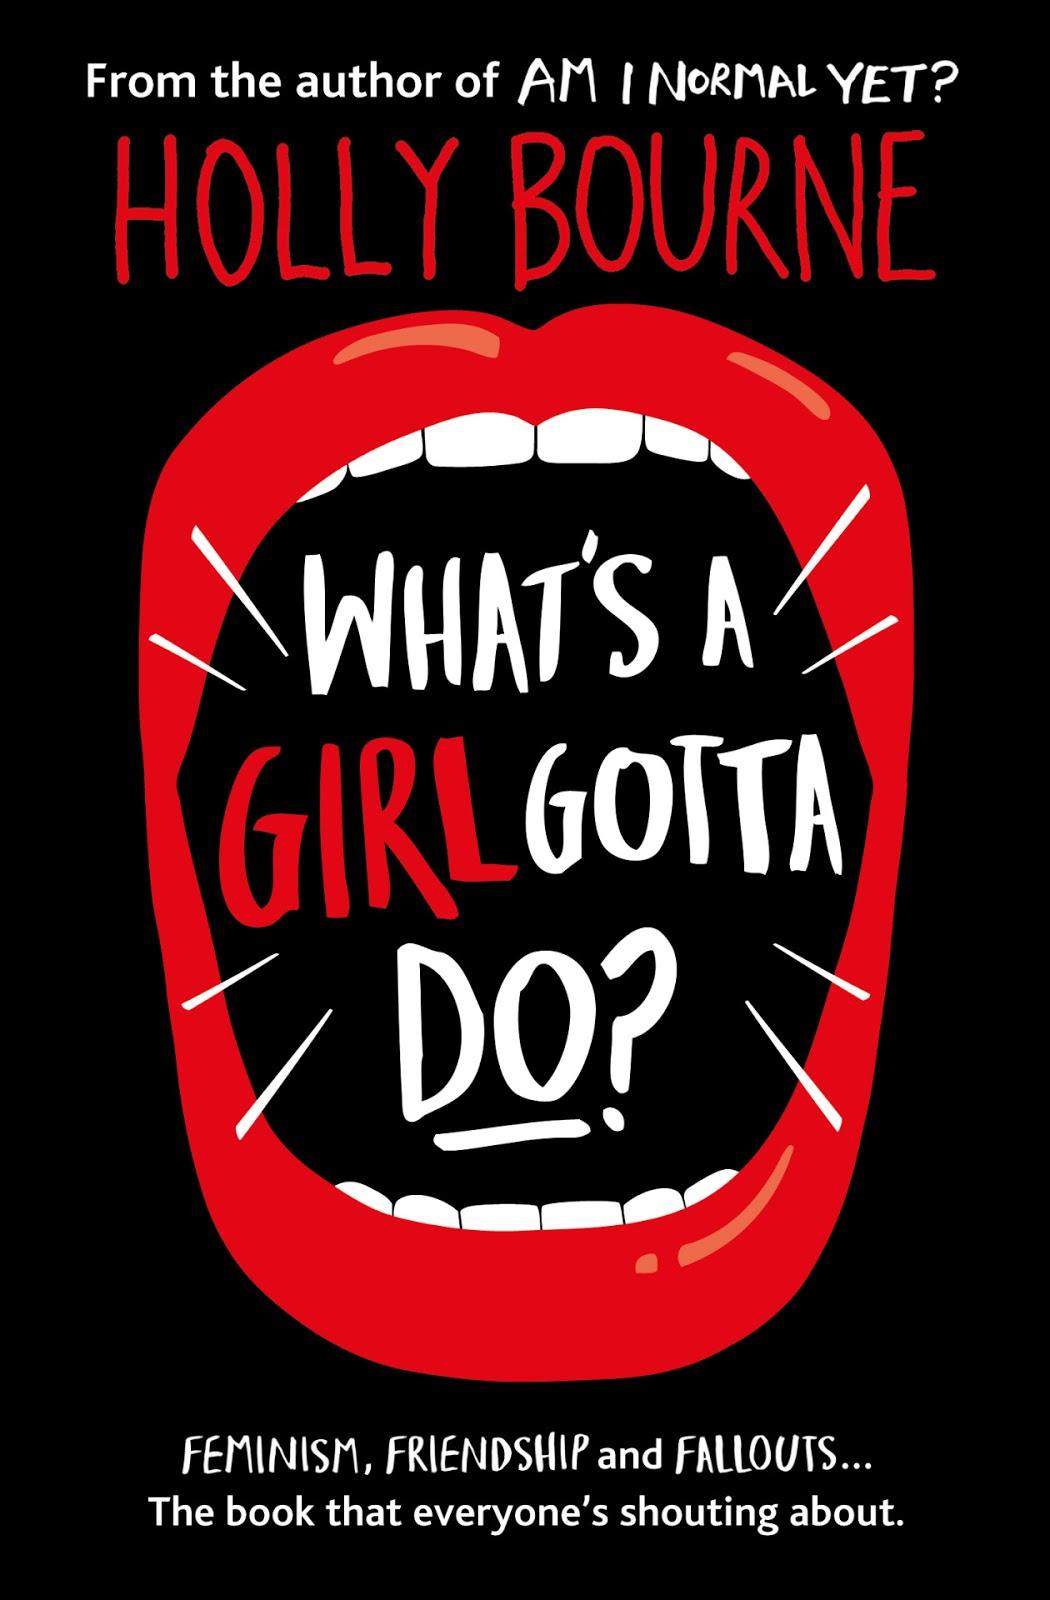 What's a Girl Gotta Do?